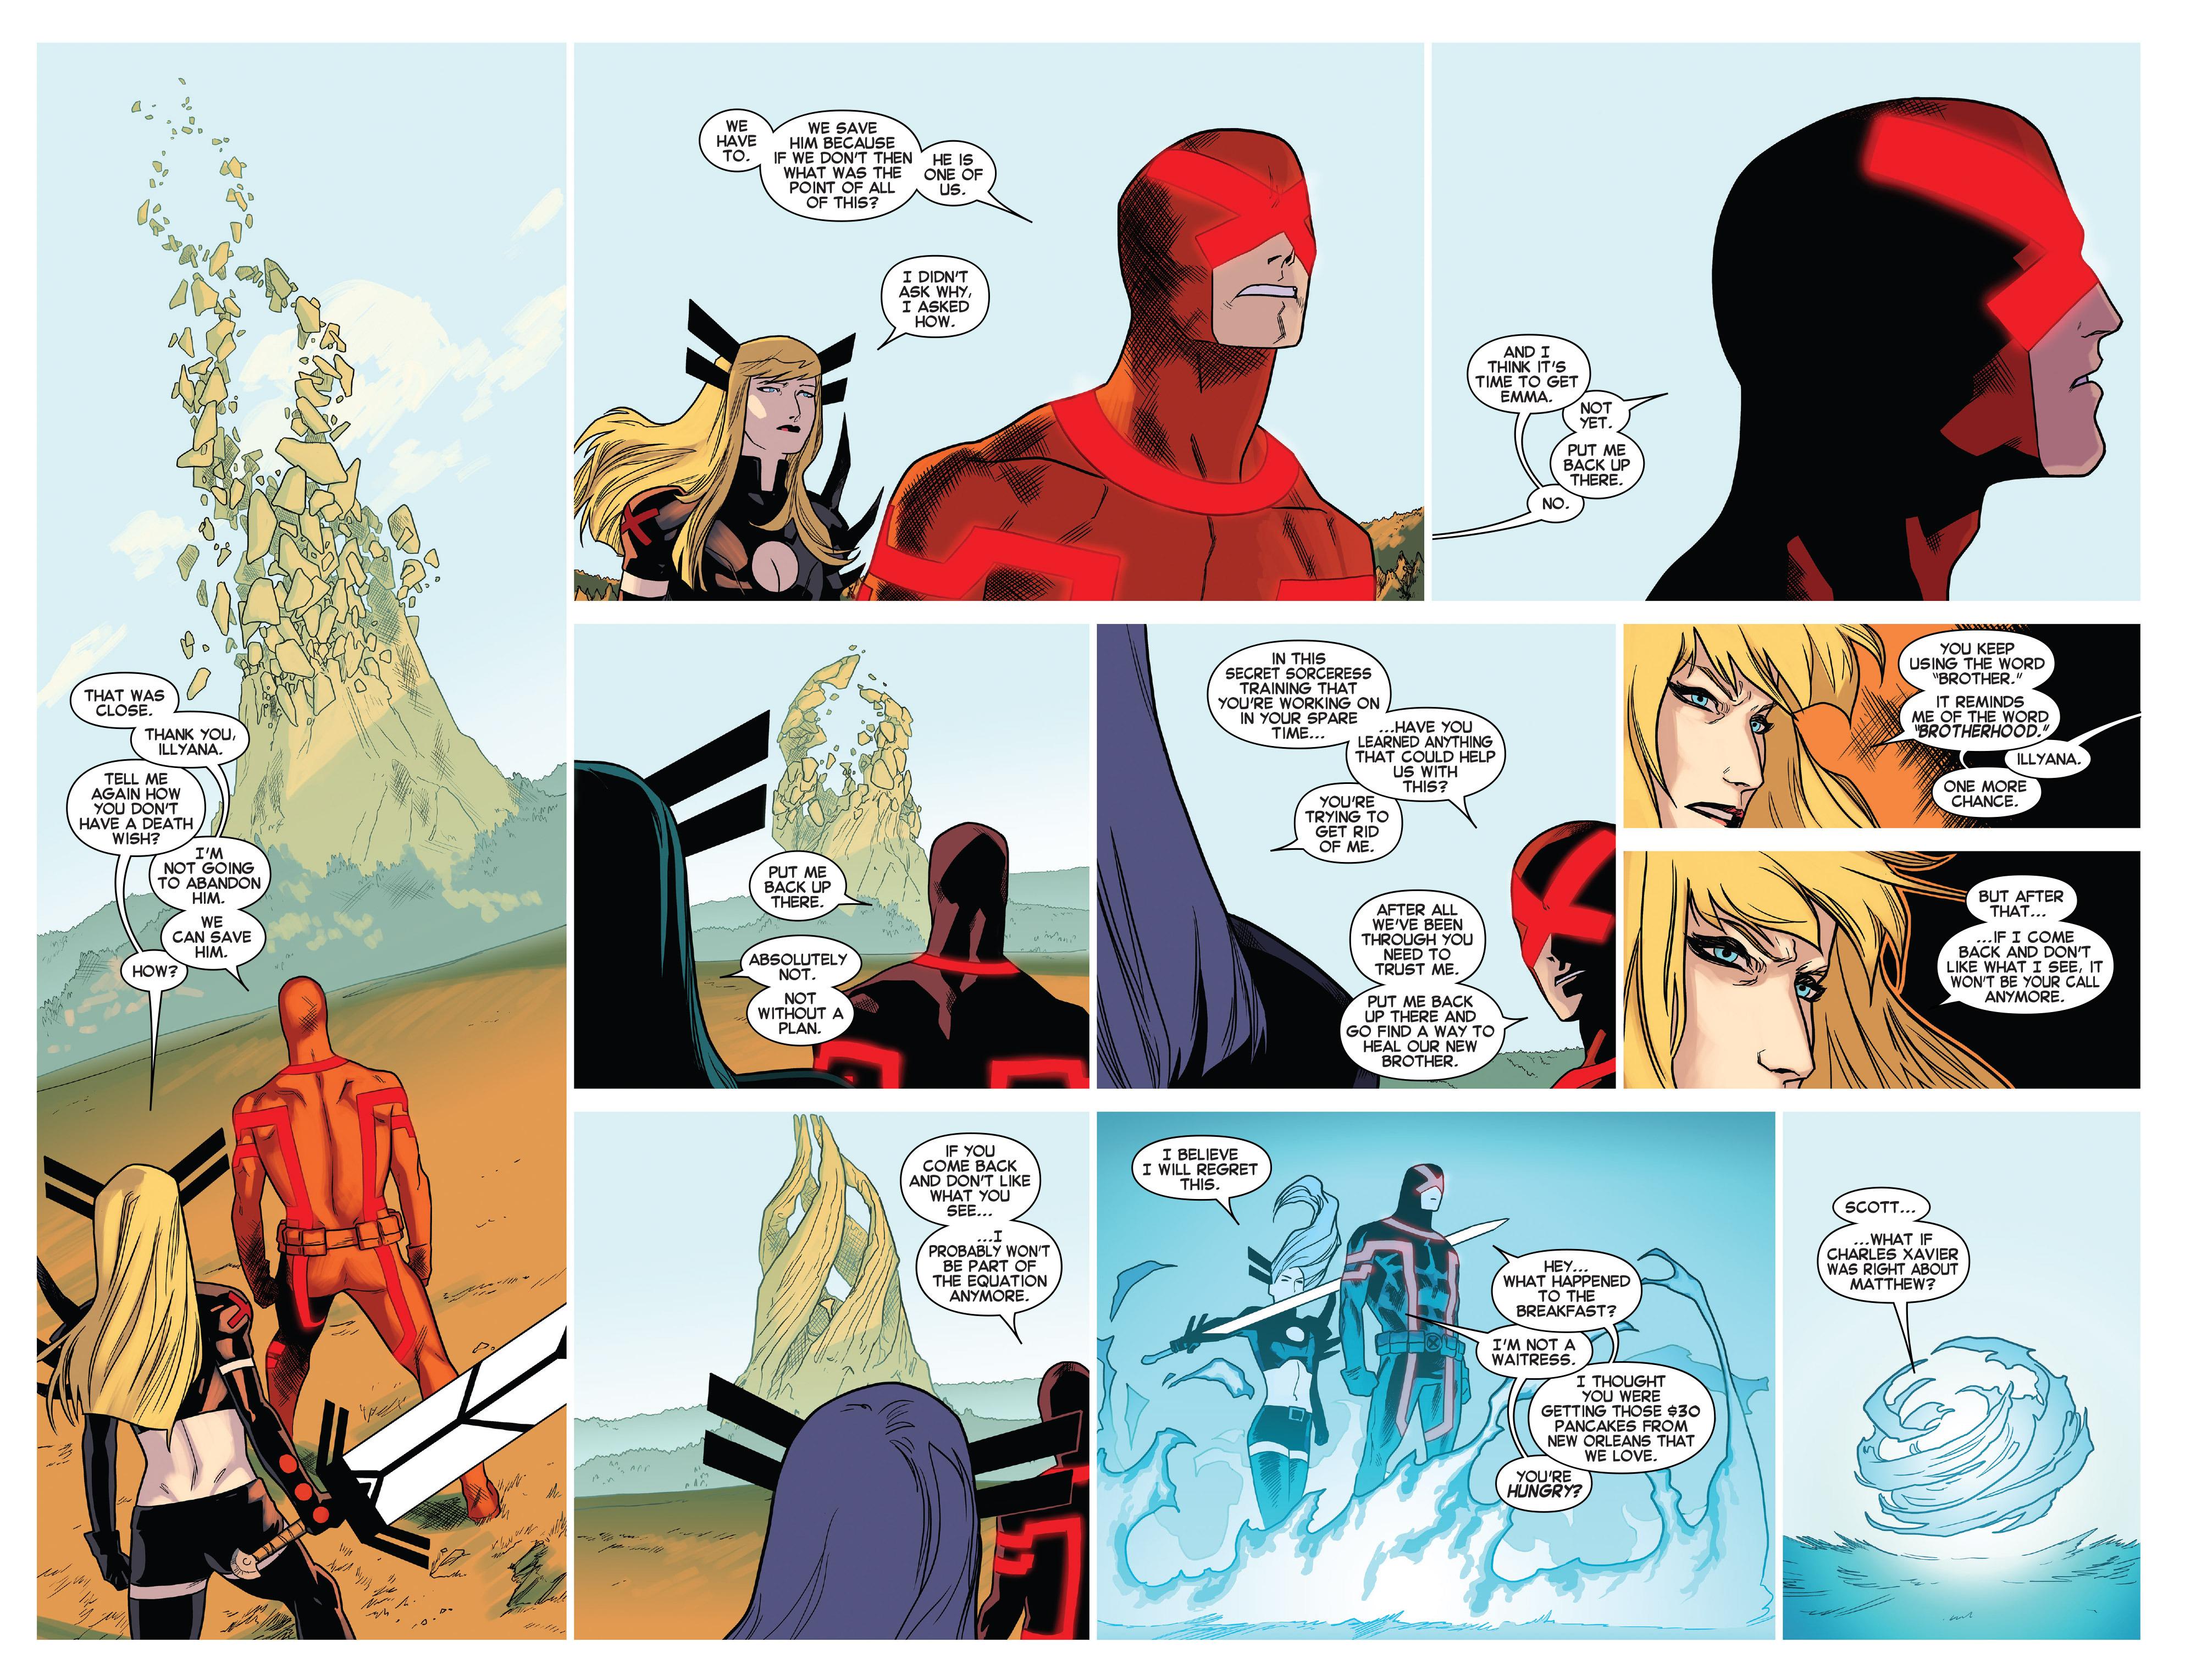 Read online Uncanny X-Men (2013) comic -  Issue # _TPB 5 - The Omega Mutant - 53